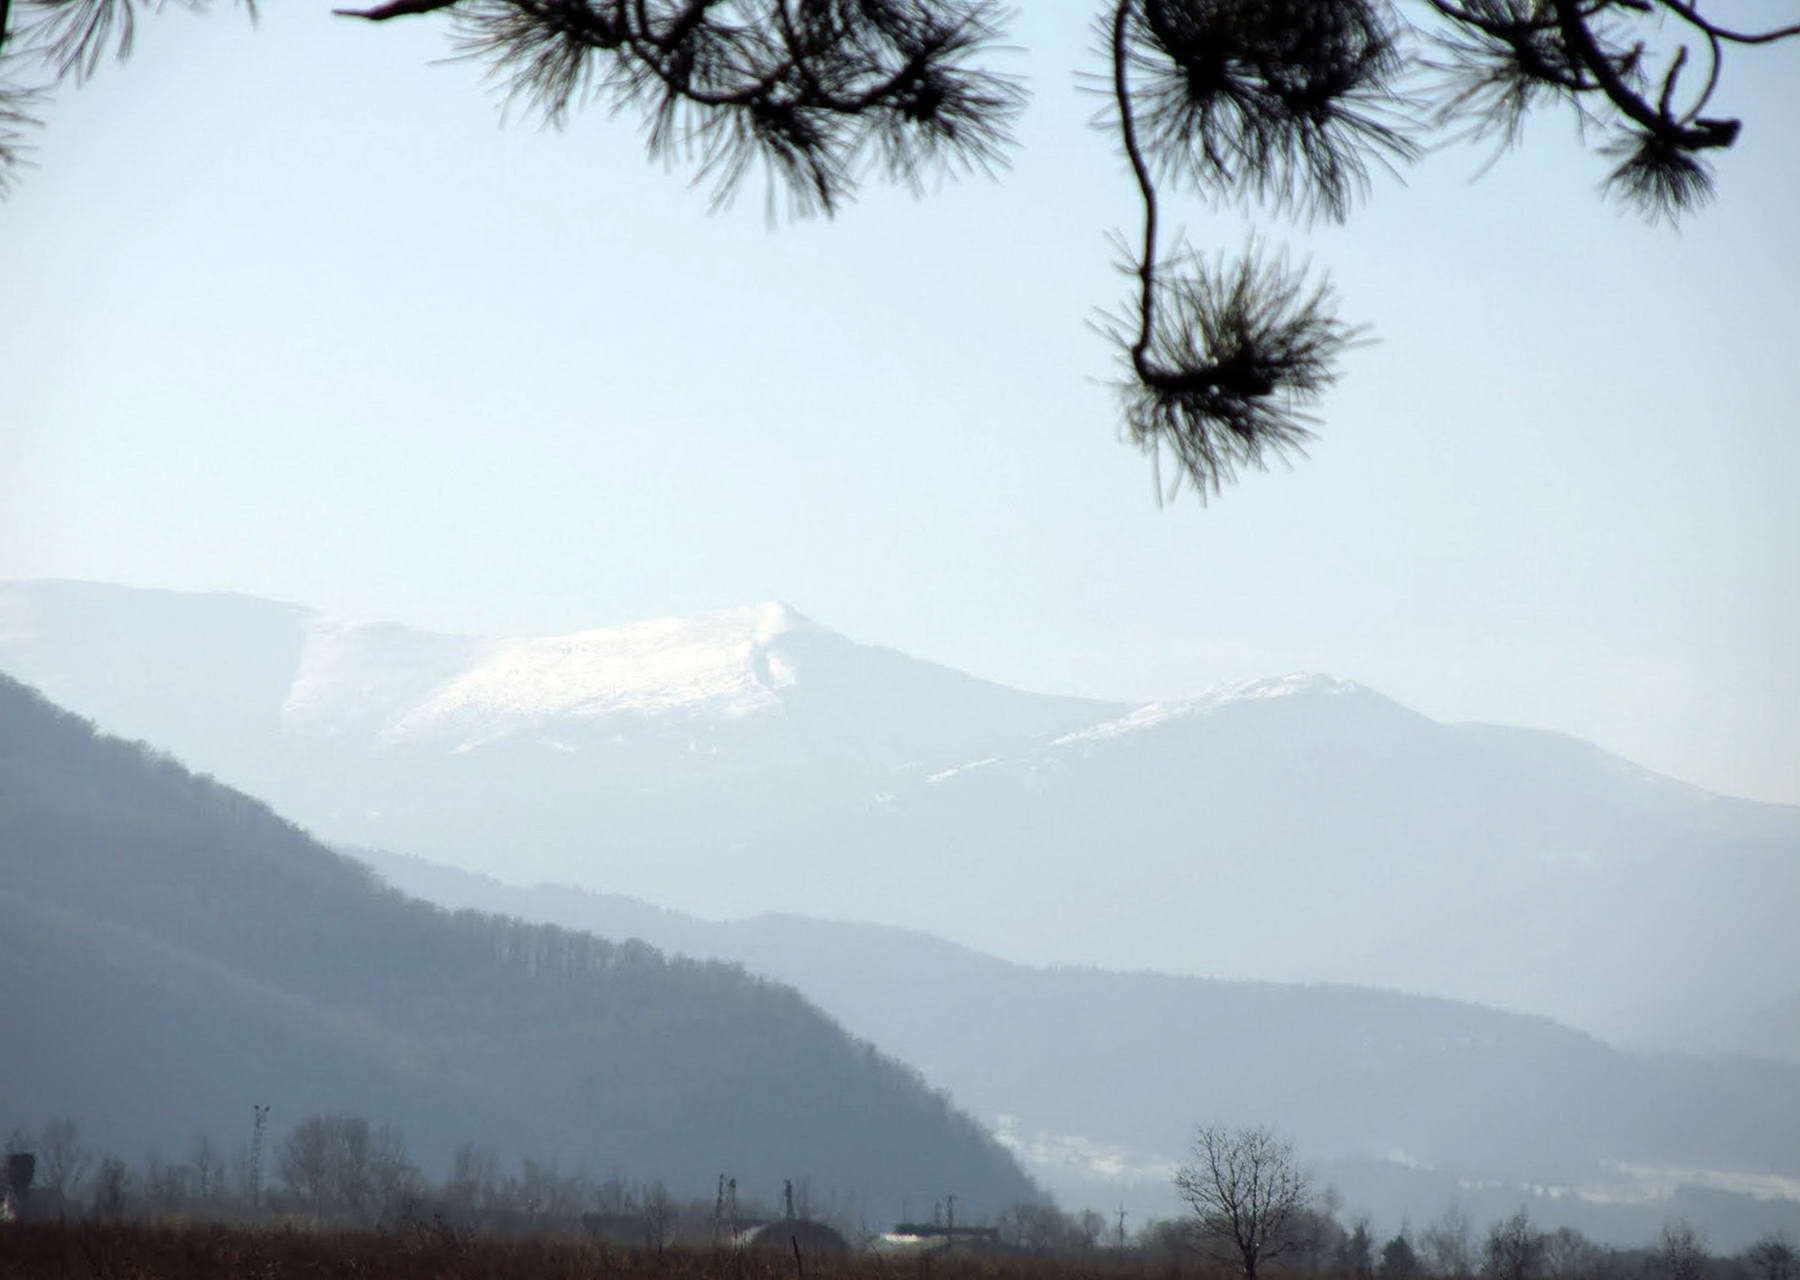 Богородчанський район, гірське село Солотвин